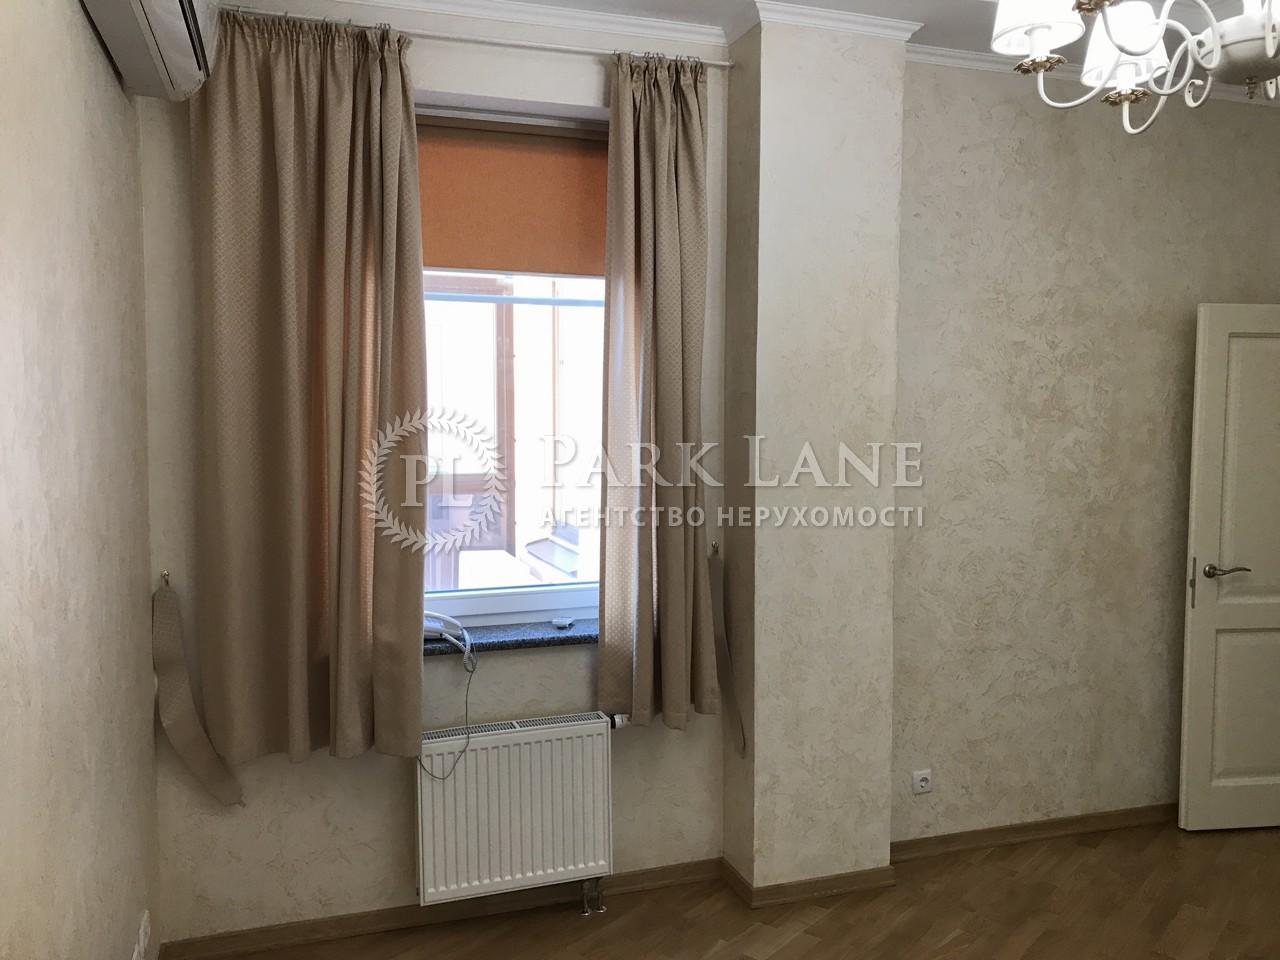 Квартира R-11328, Толстого Льва, 39, Киев - Фото 11